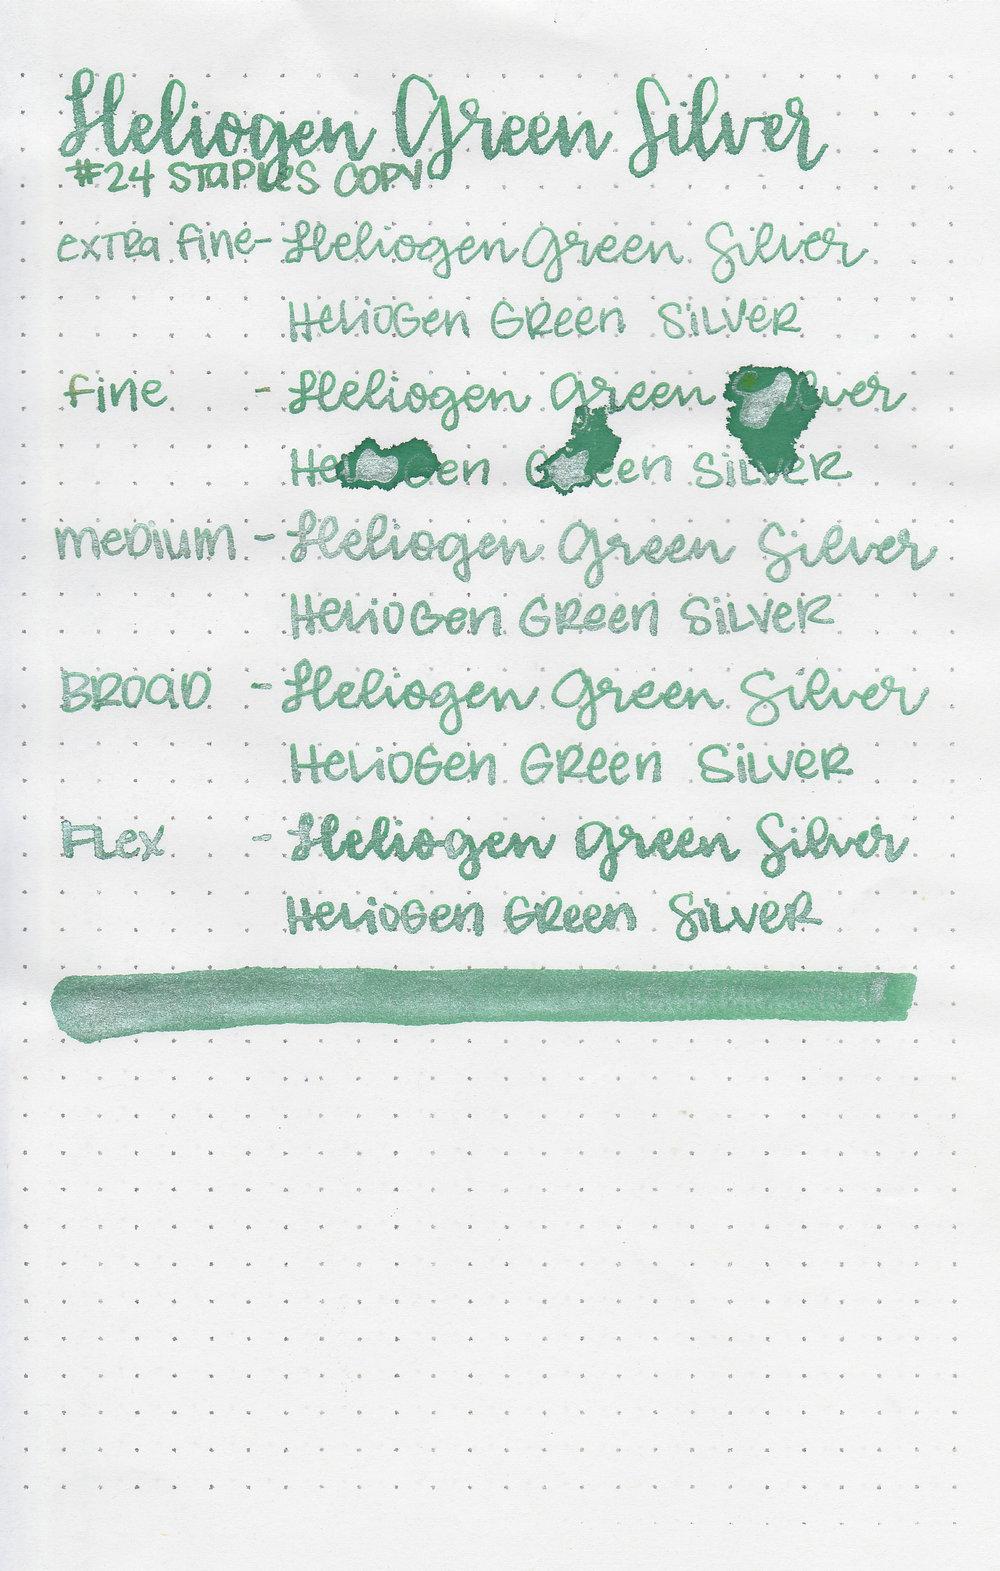 da-heliogen-green-14.jpg